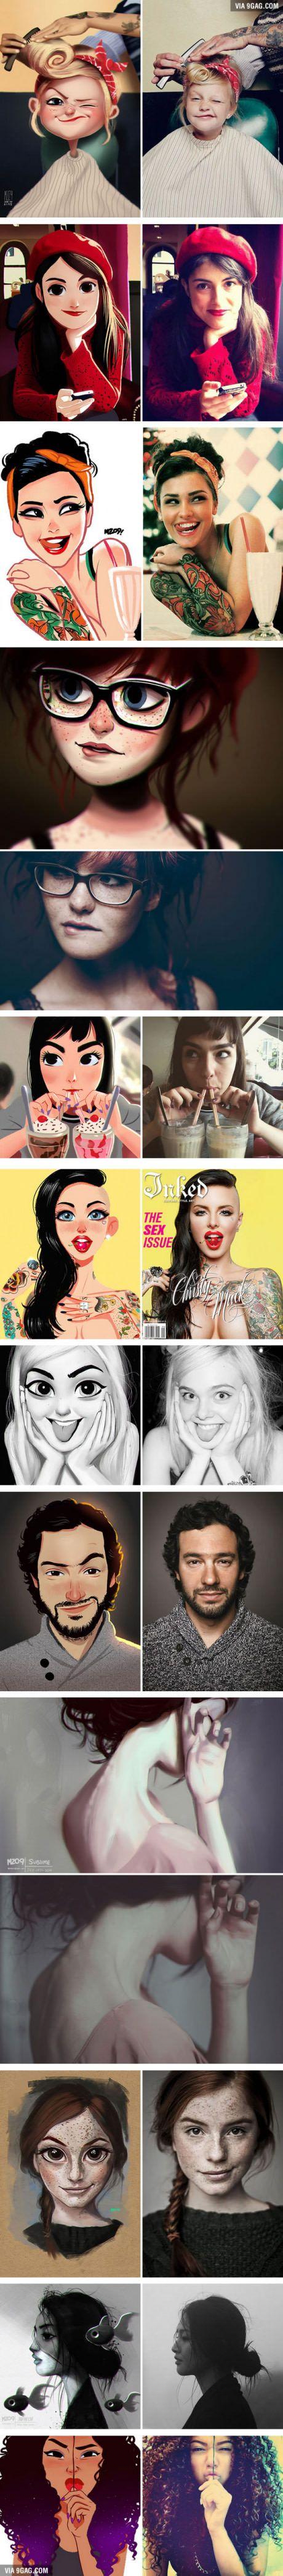 Artist Turns Photos Of Random People Into Fun Illustrations (By Julio Cesar)